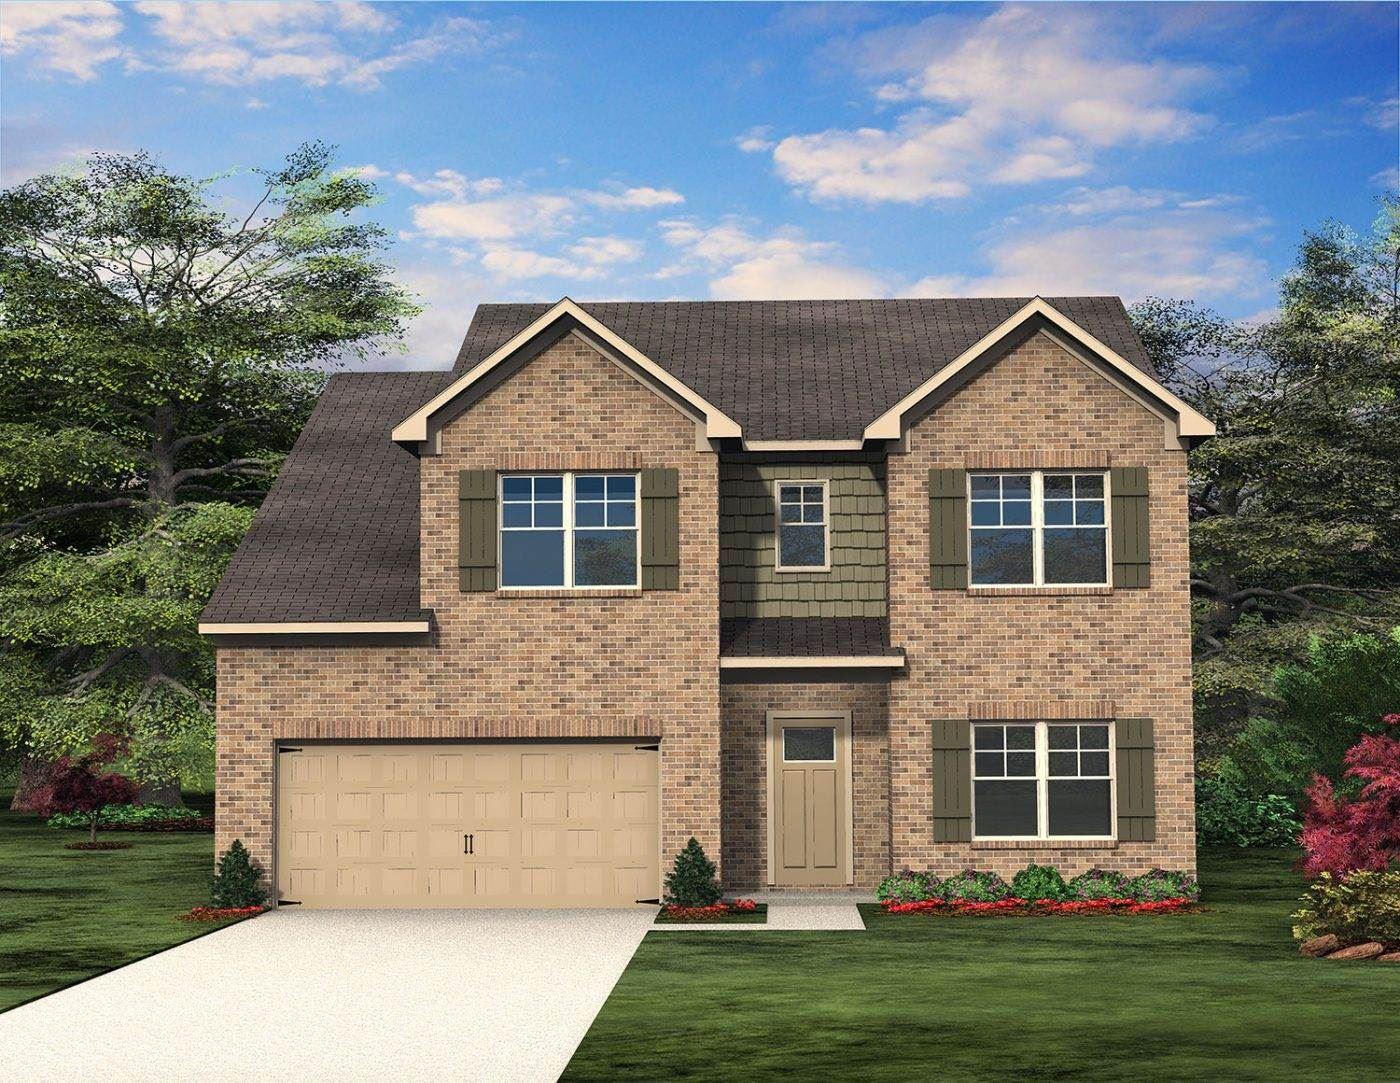 223 Crestbrook Ln, Dallas, GA 30157 - MLS#: 8860938